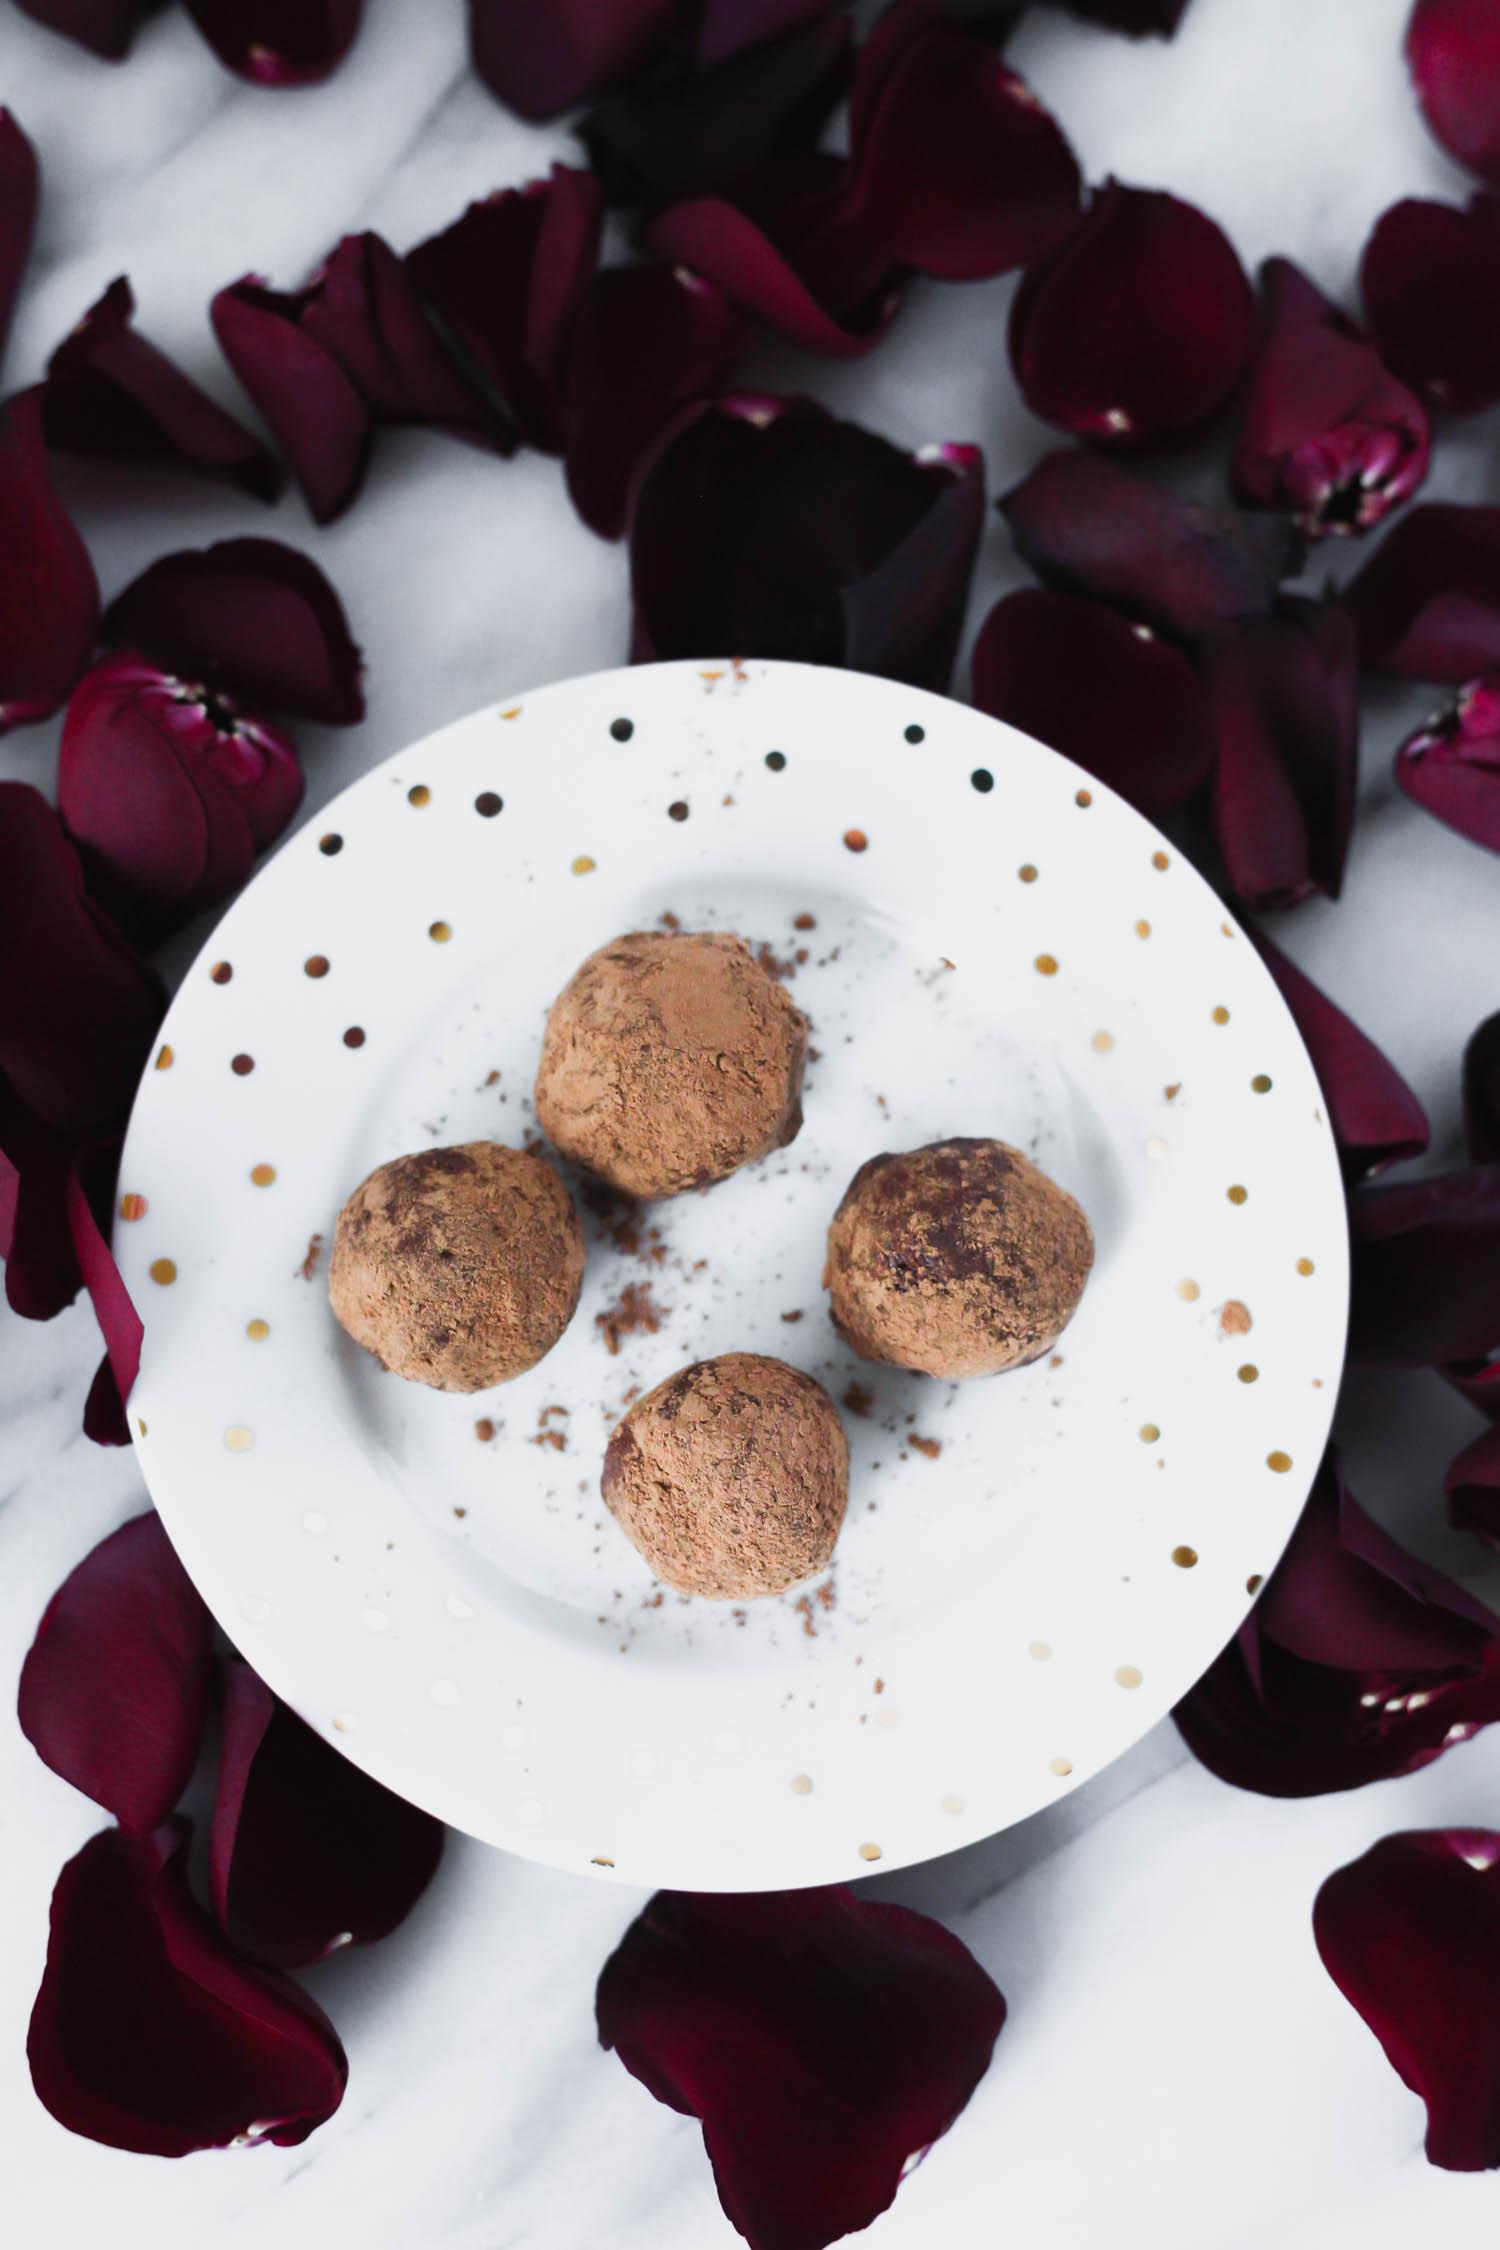 Chocolate Macadamia Truffles, Vegan Recipe by Beautiful Ingredient